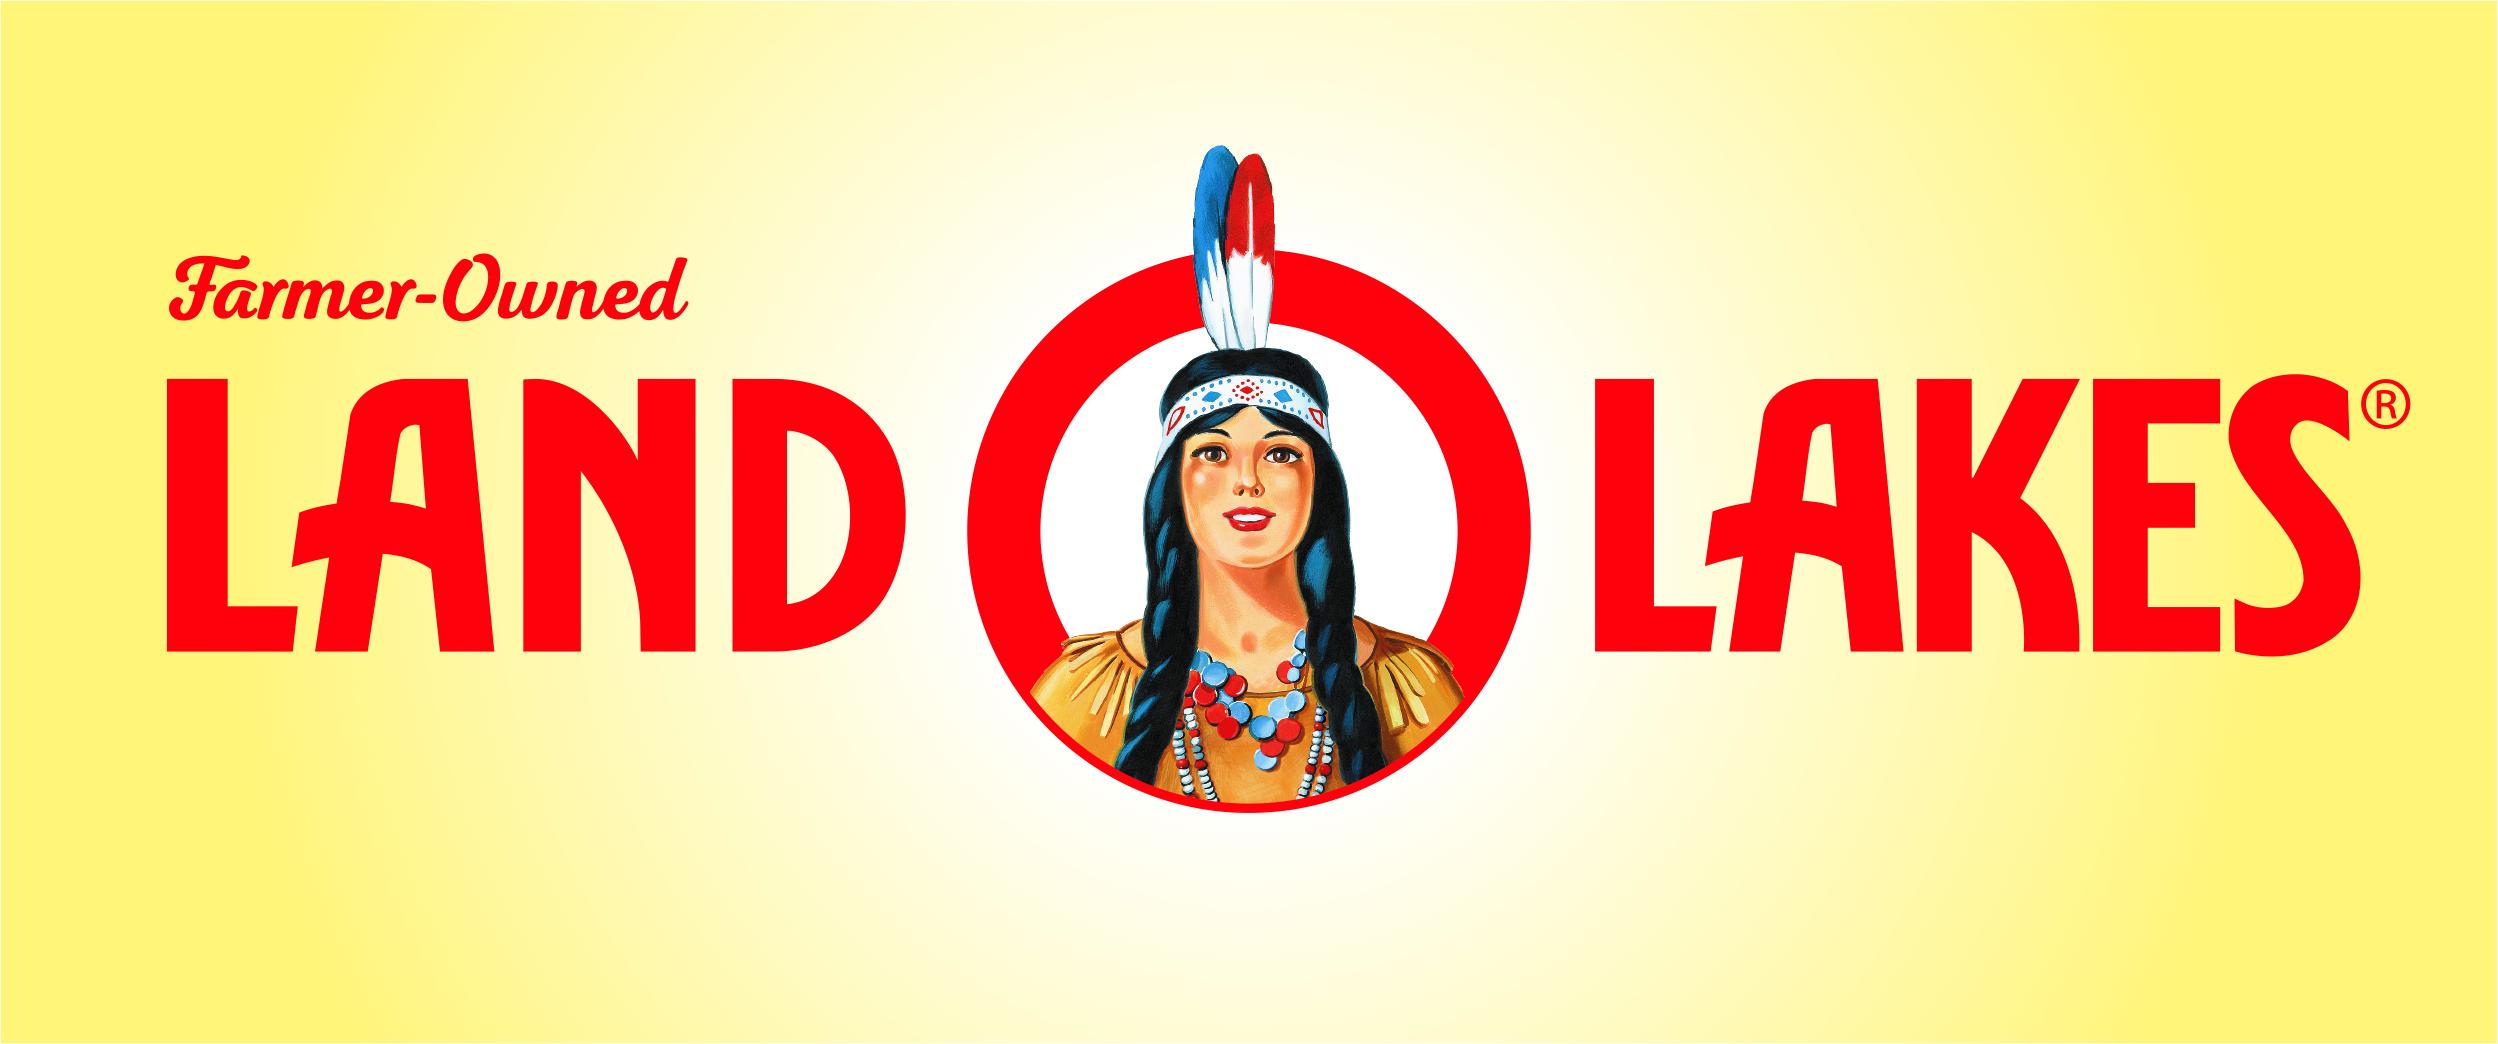 Land O'Lakes 2018 logo